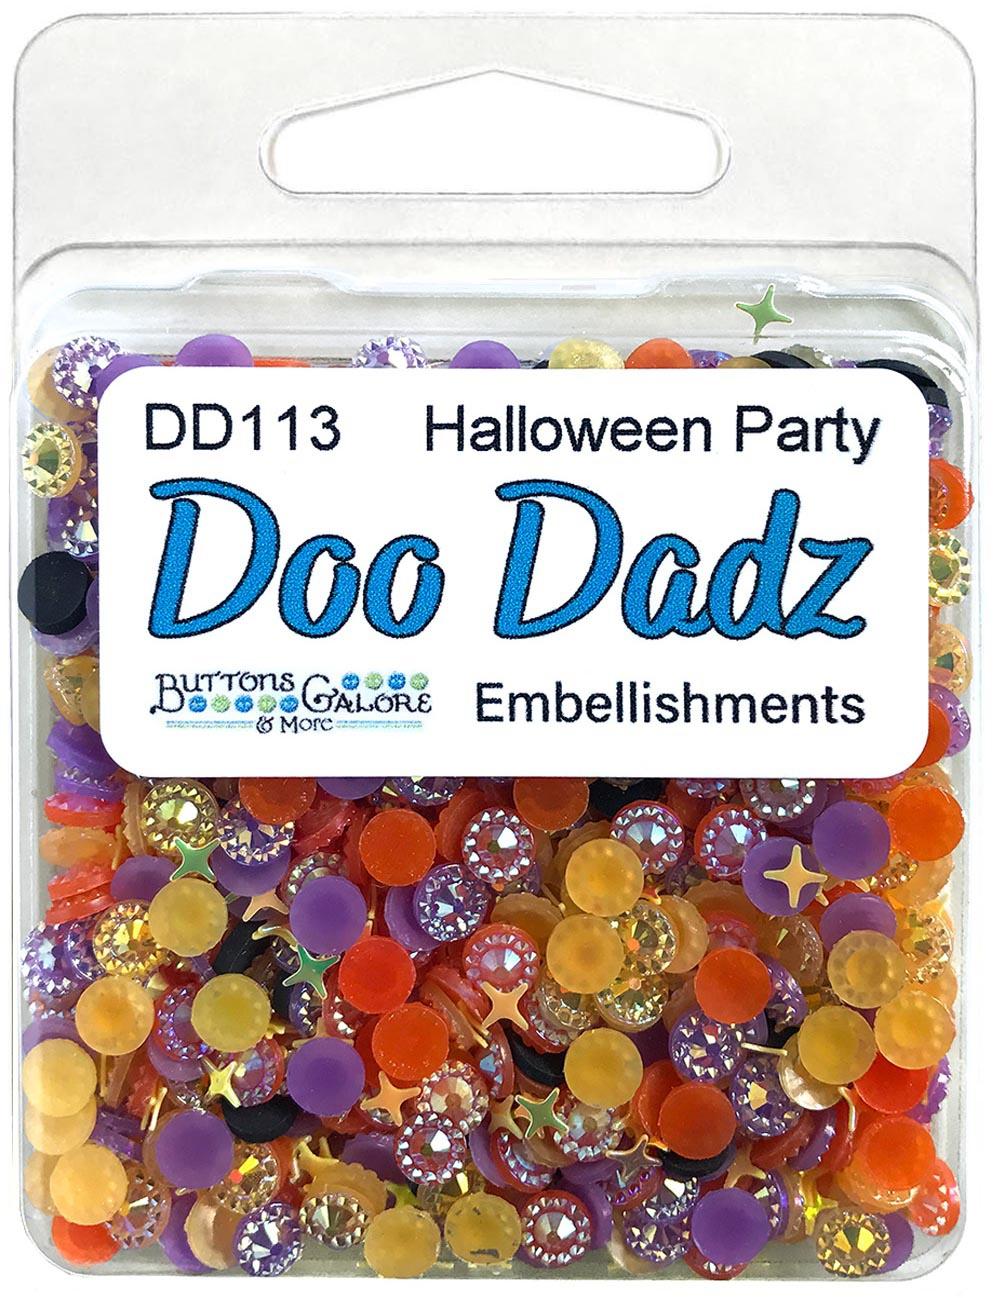 Buttons Galore Doodadz Embellishments-Halloween Party